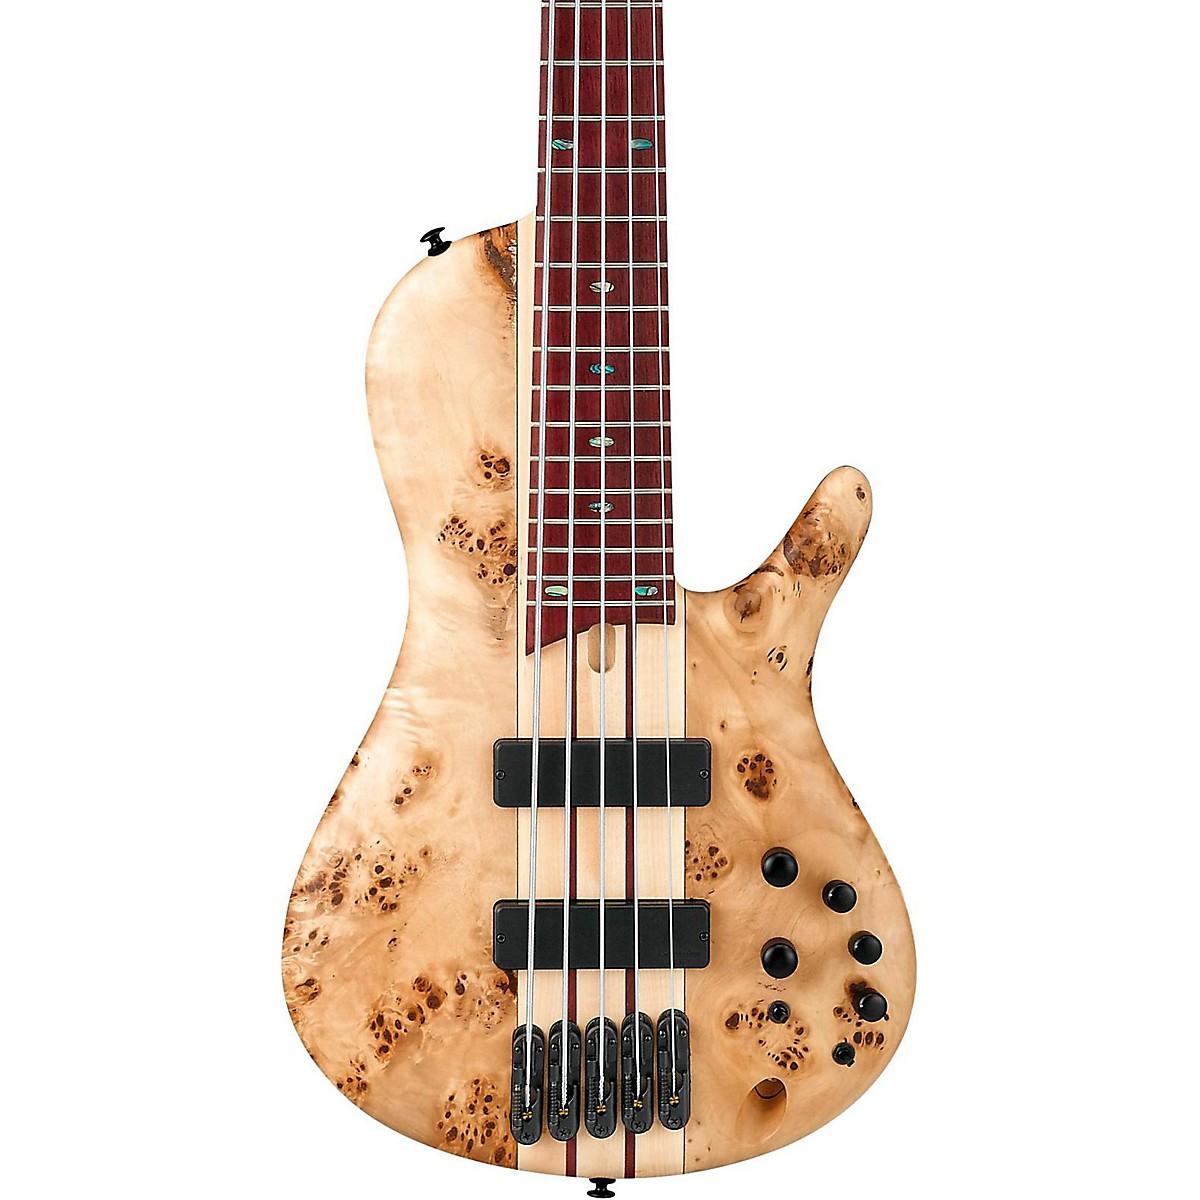 Ibanez Bass Workshop SR Cerro SRSC805 5-String Electric Bass